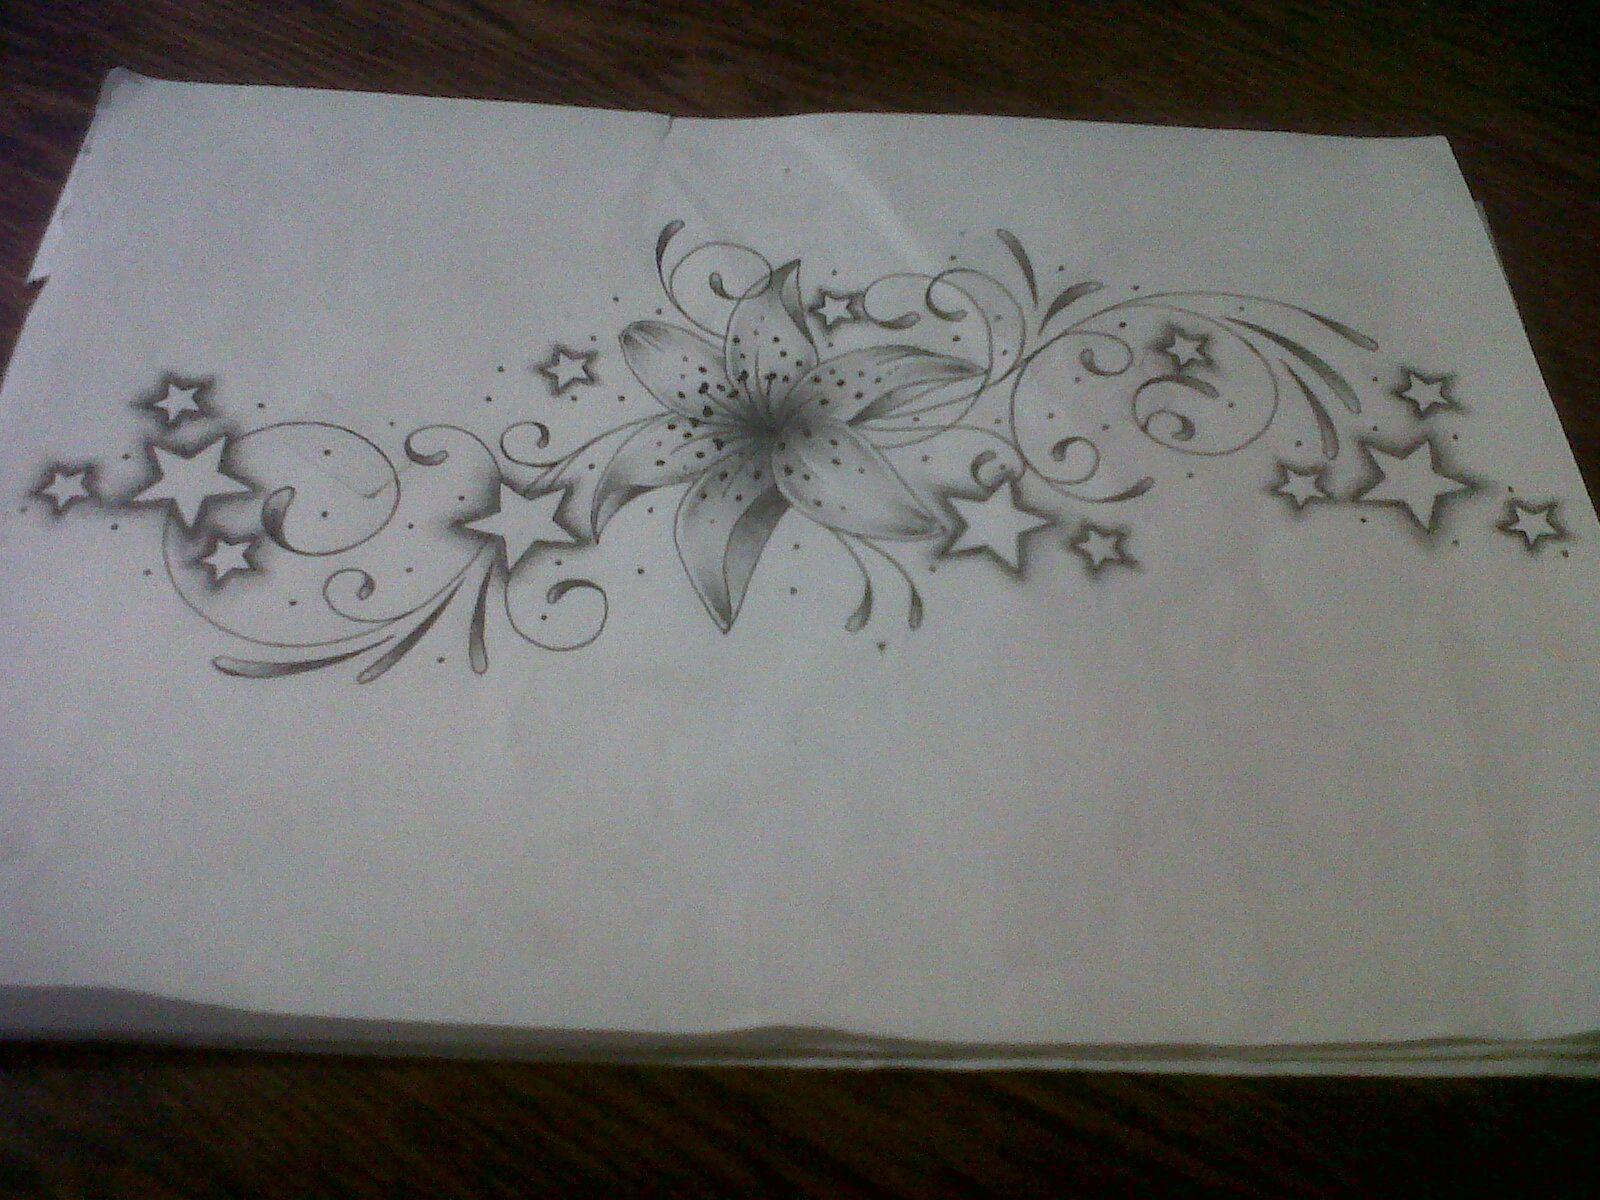 Butterfly star tattoo designs - Star Swirl Flower Tattoo Design Lily Tattoo Design With Swirls And